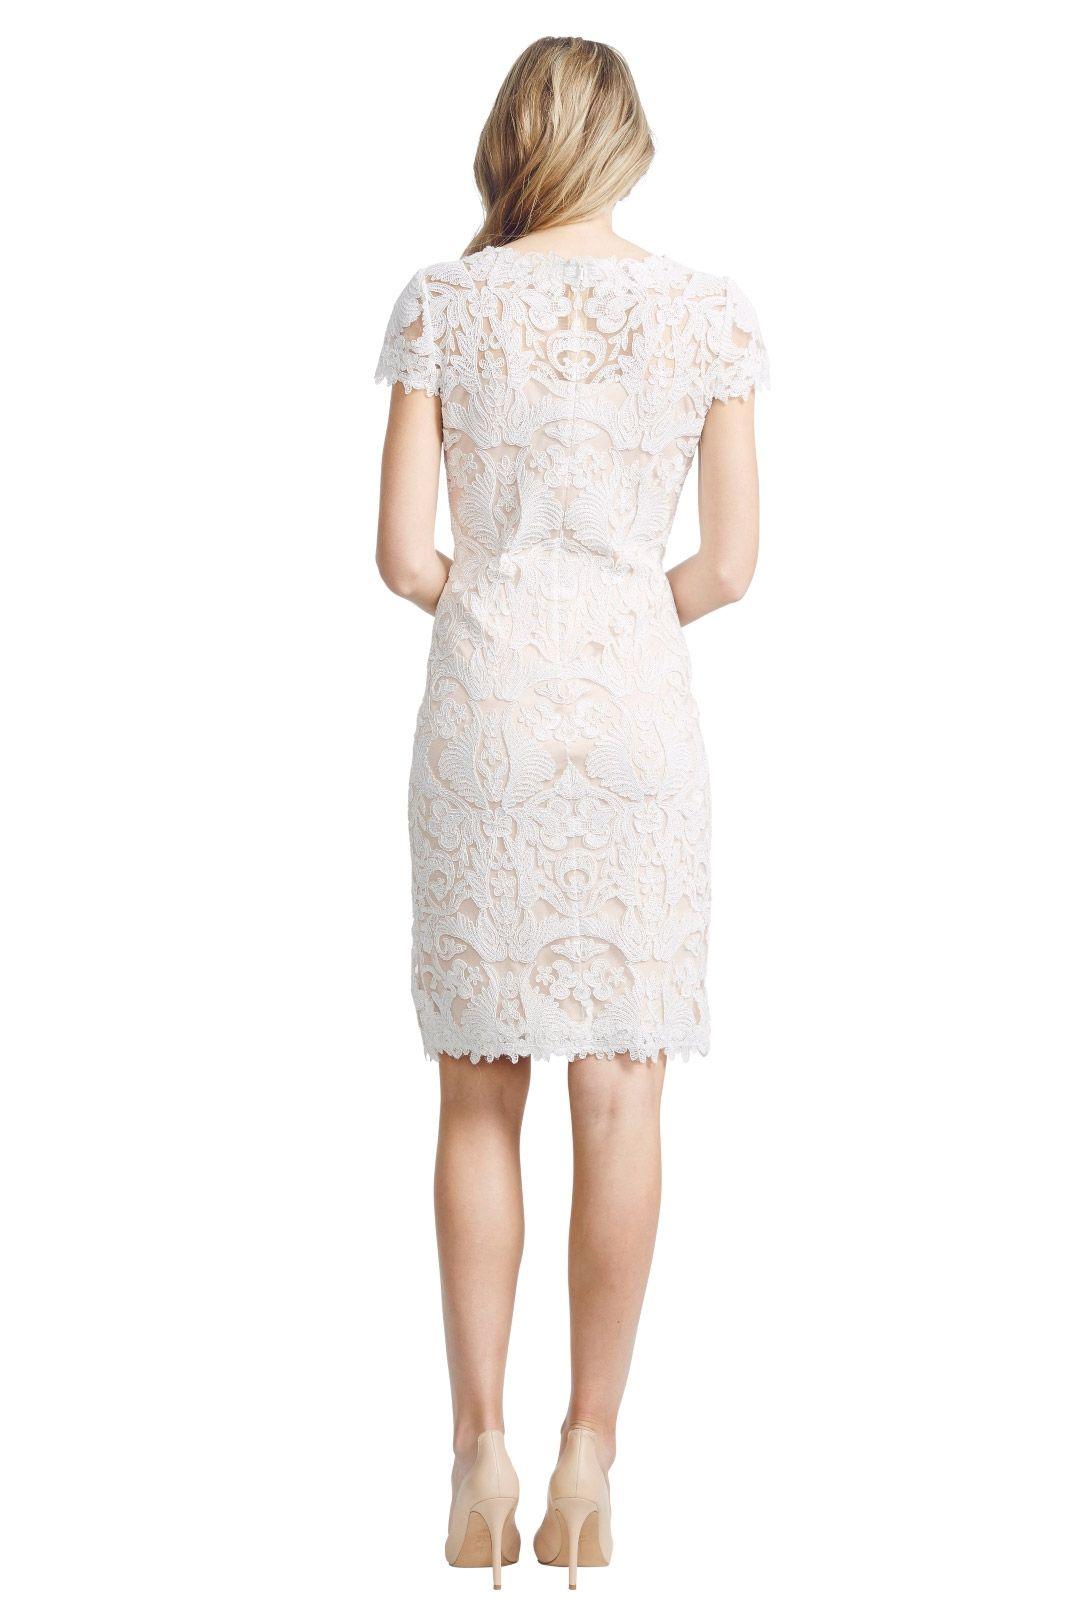 Tadashi Shoji - White Corded Lace - White - Back